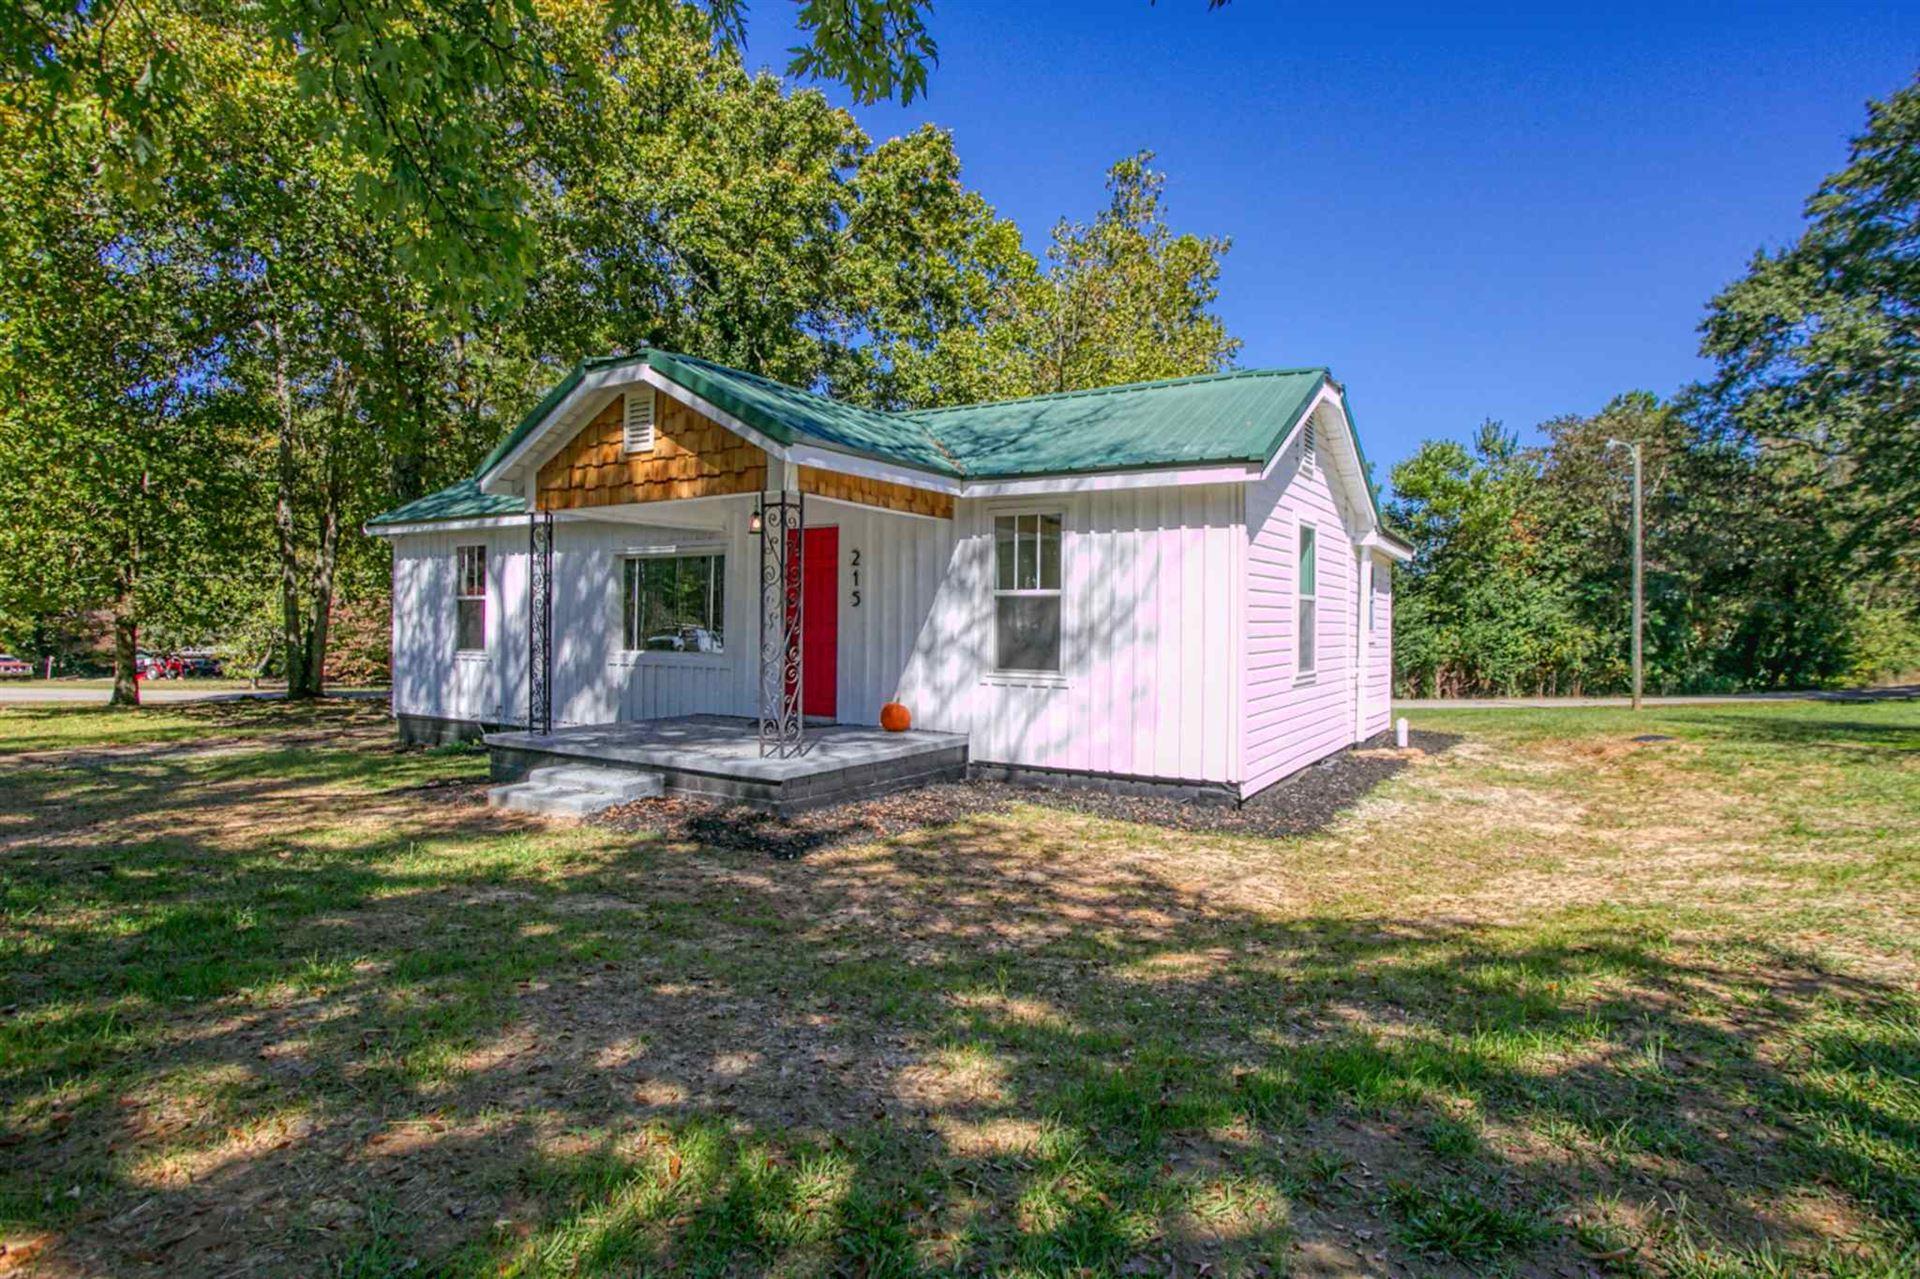 215 Mulberry Rock Rd, Temple, GA 30179 - MLS#: 8869390